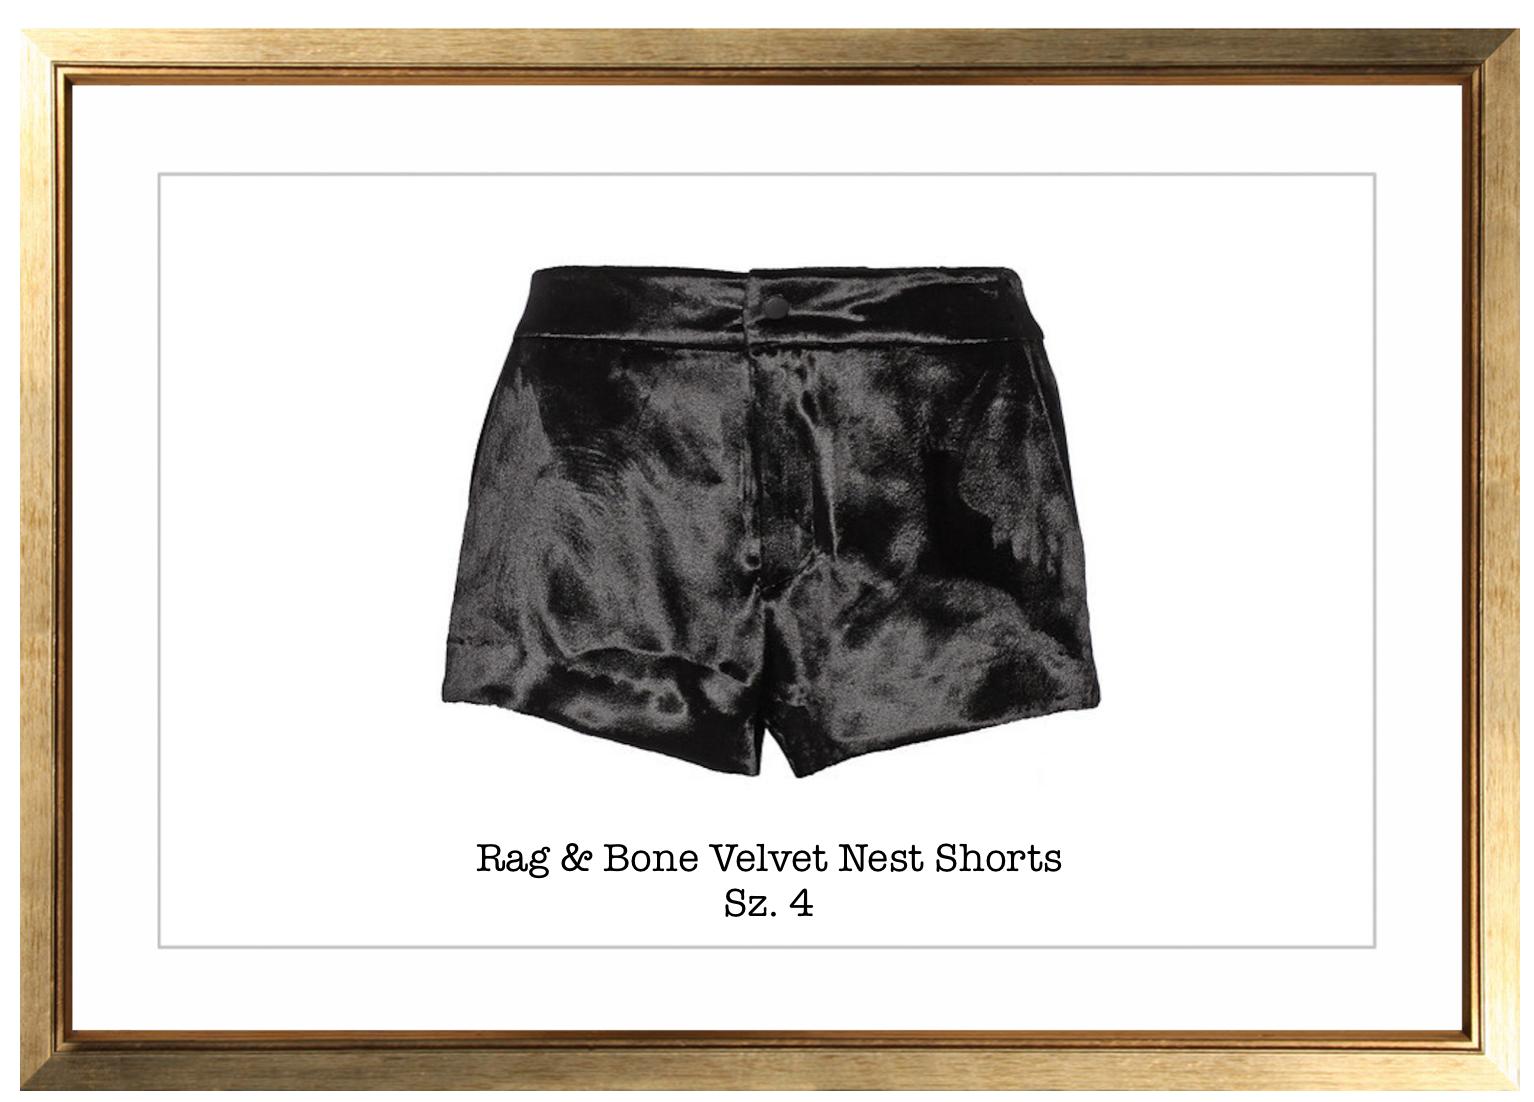 Nesi Shorts